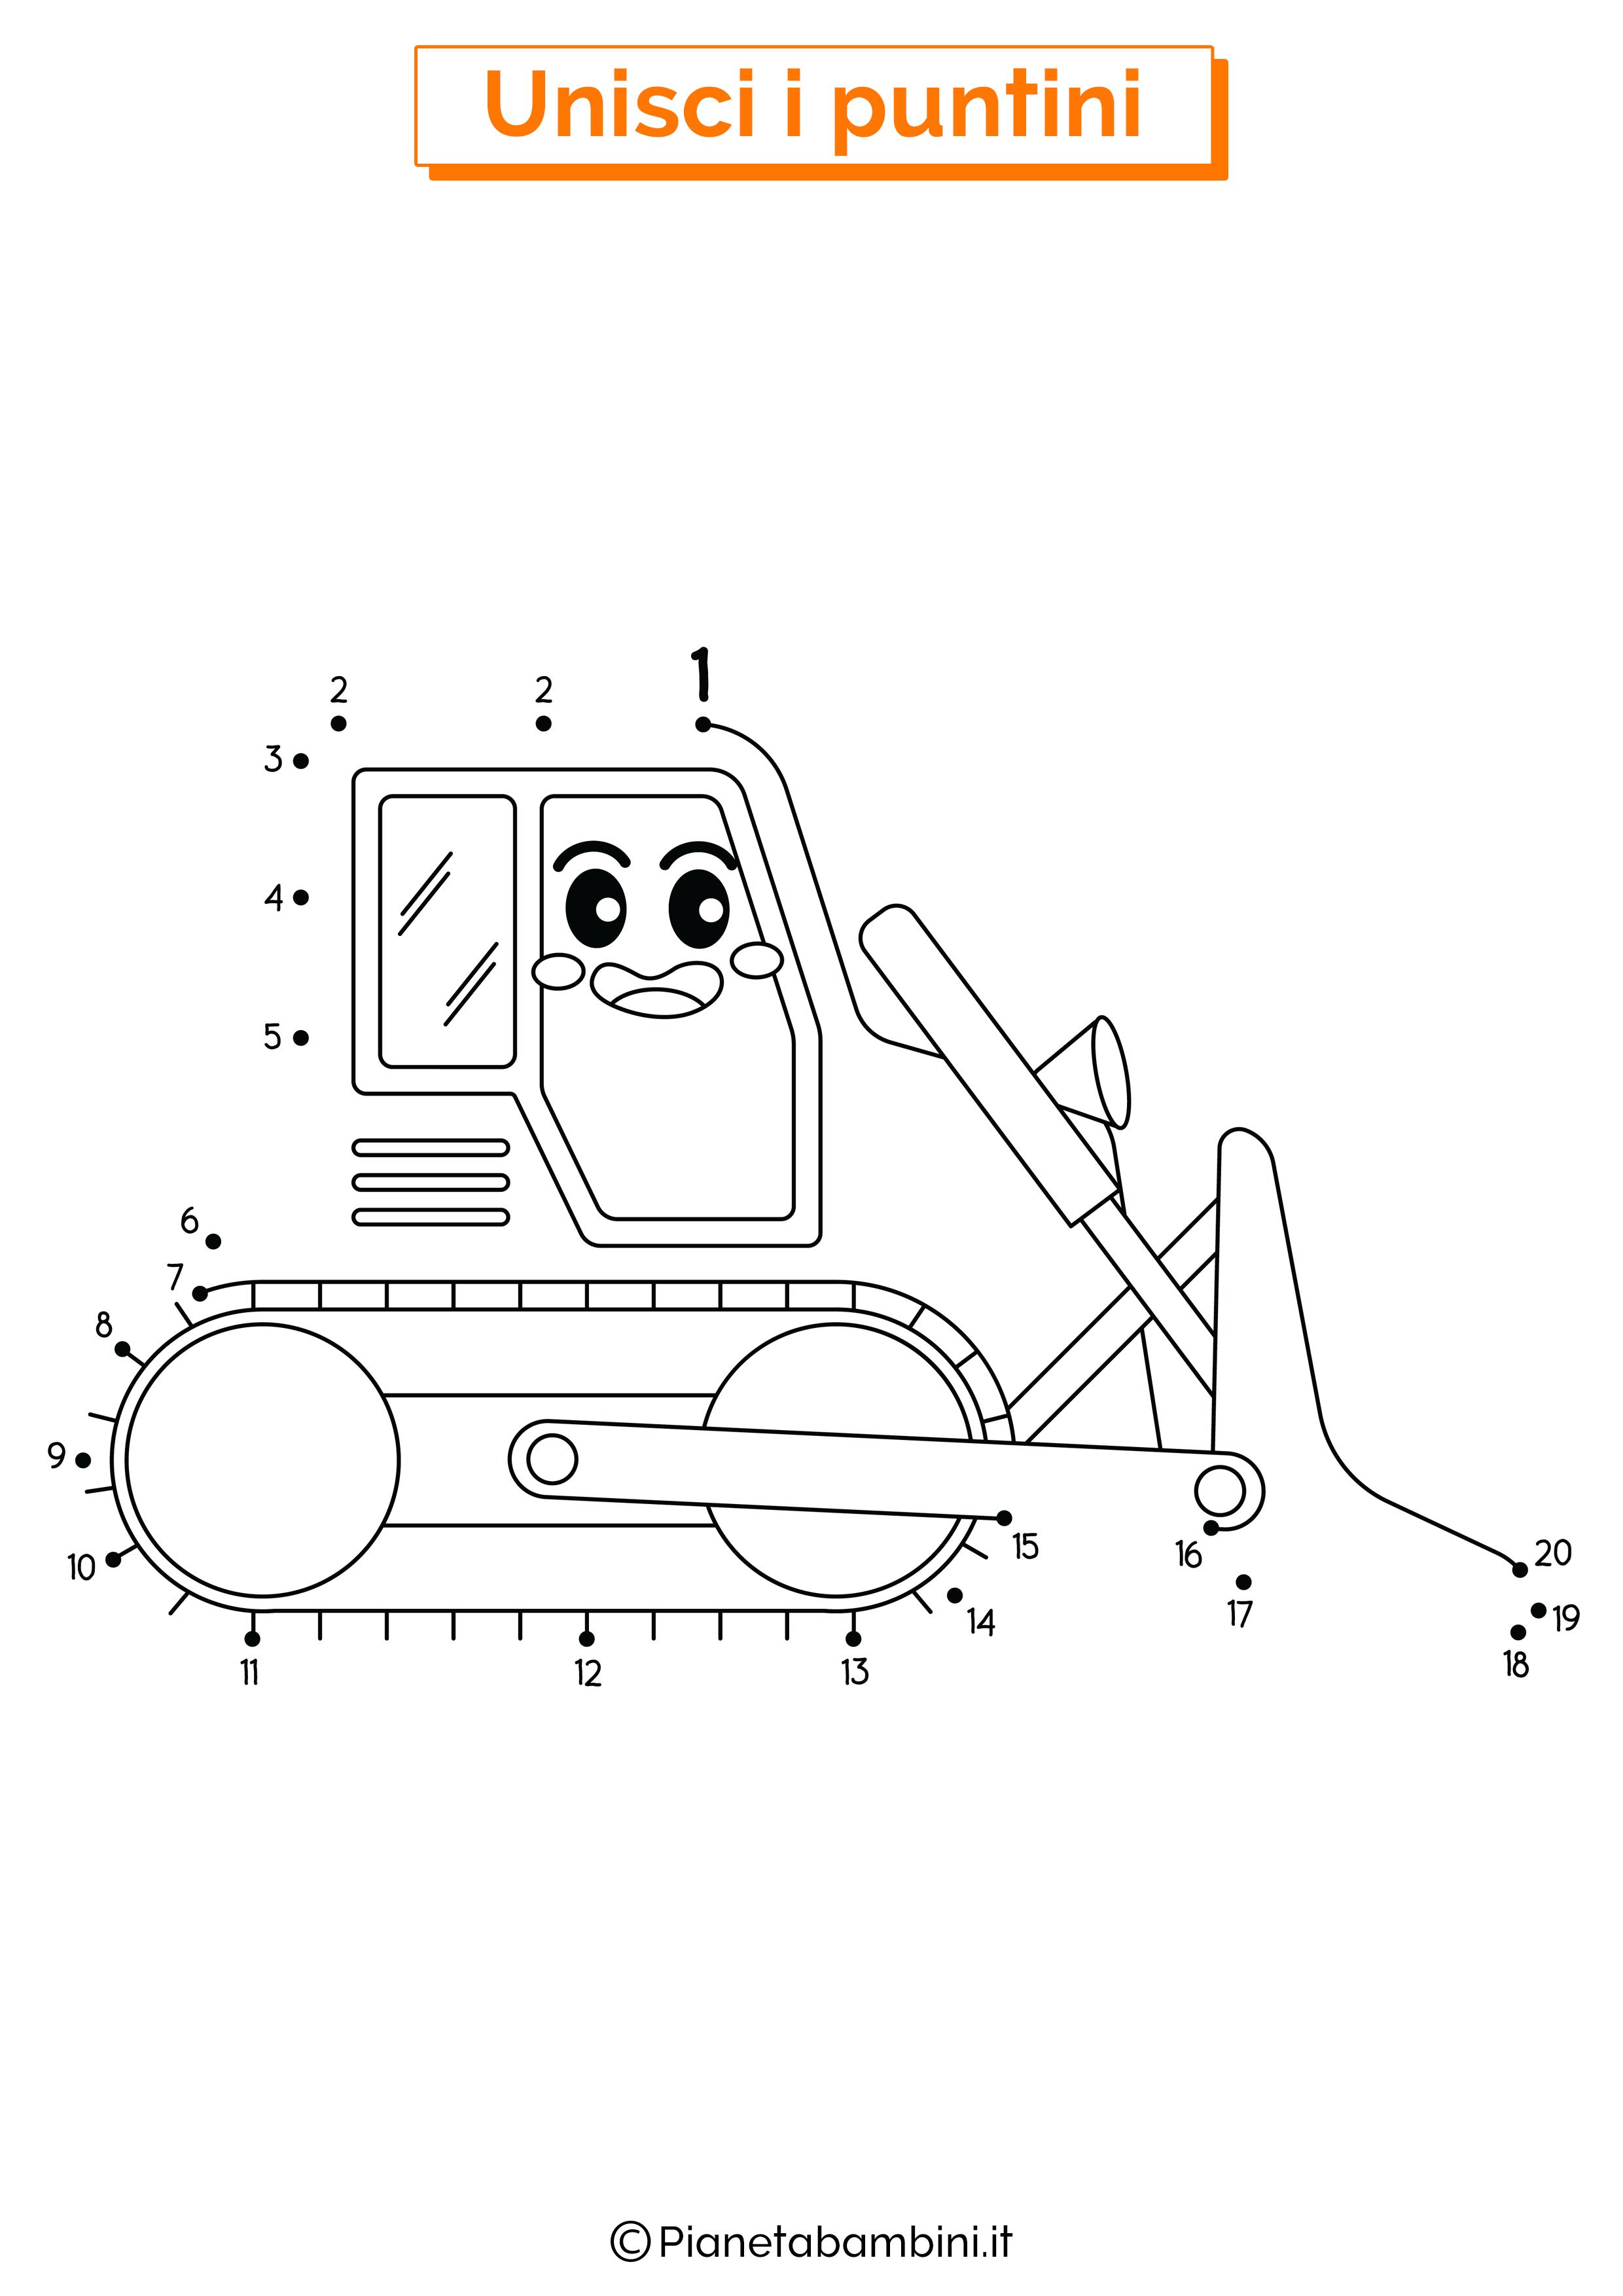 Disegno unisci i puntini bulldozer